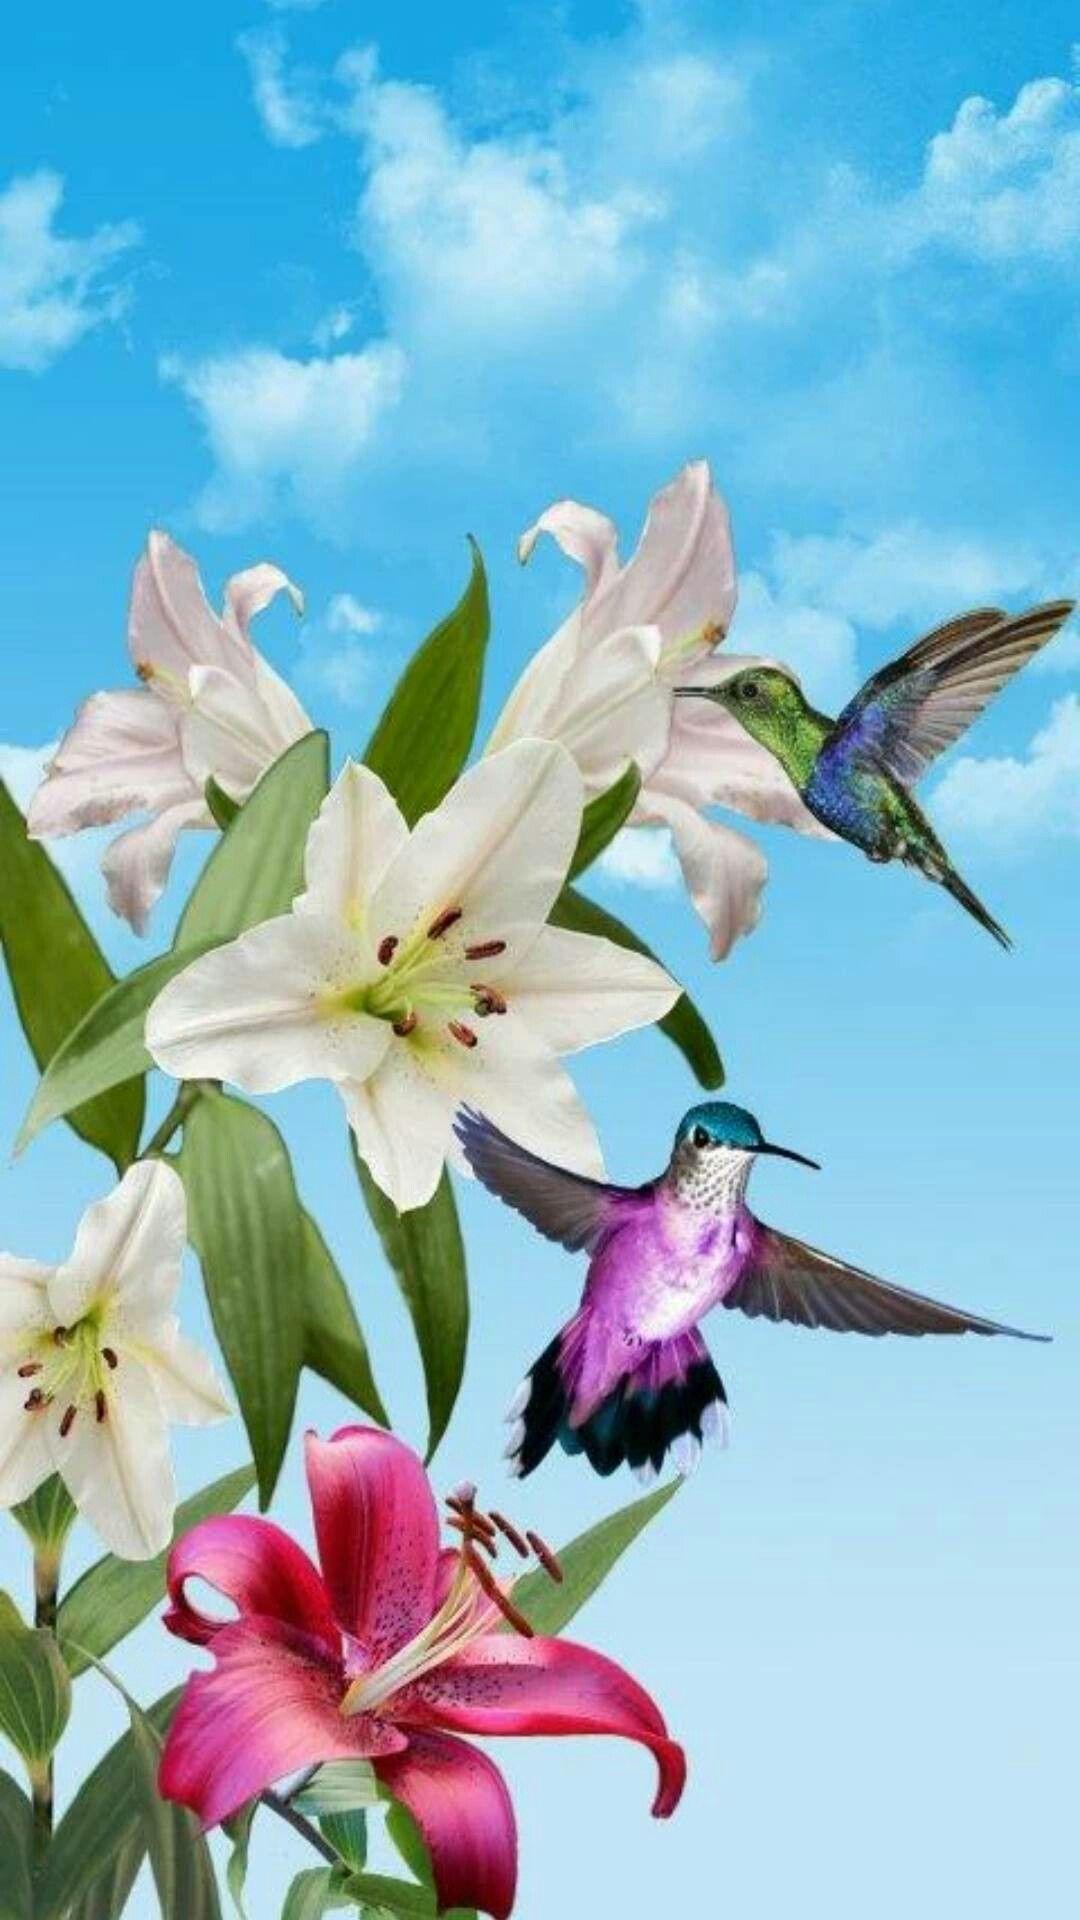 Hummingbirds Hummingbird Wallpaper Backgrounds Hummingbird Wallpaper Live Wallpapers